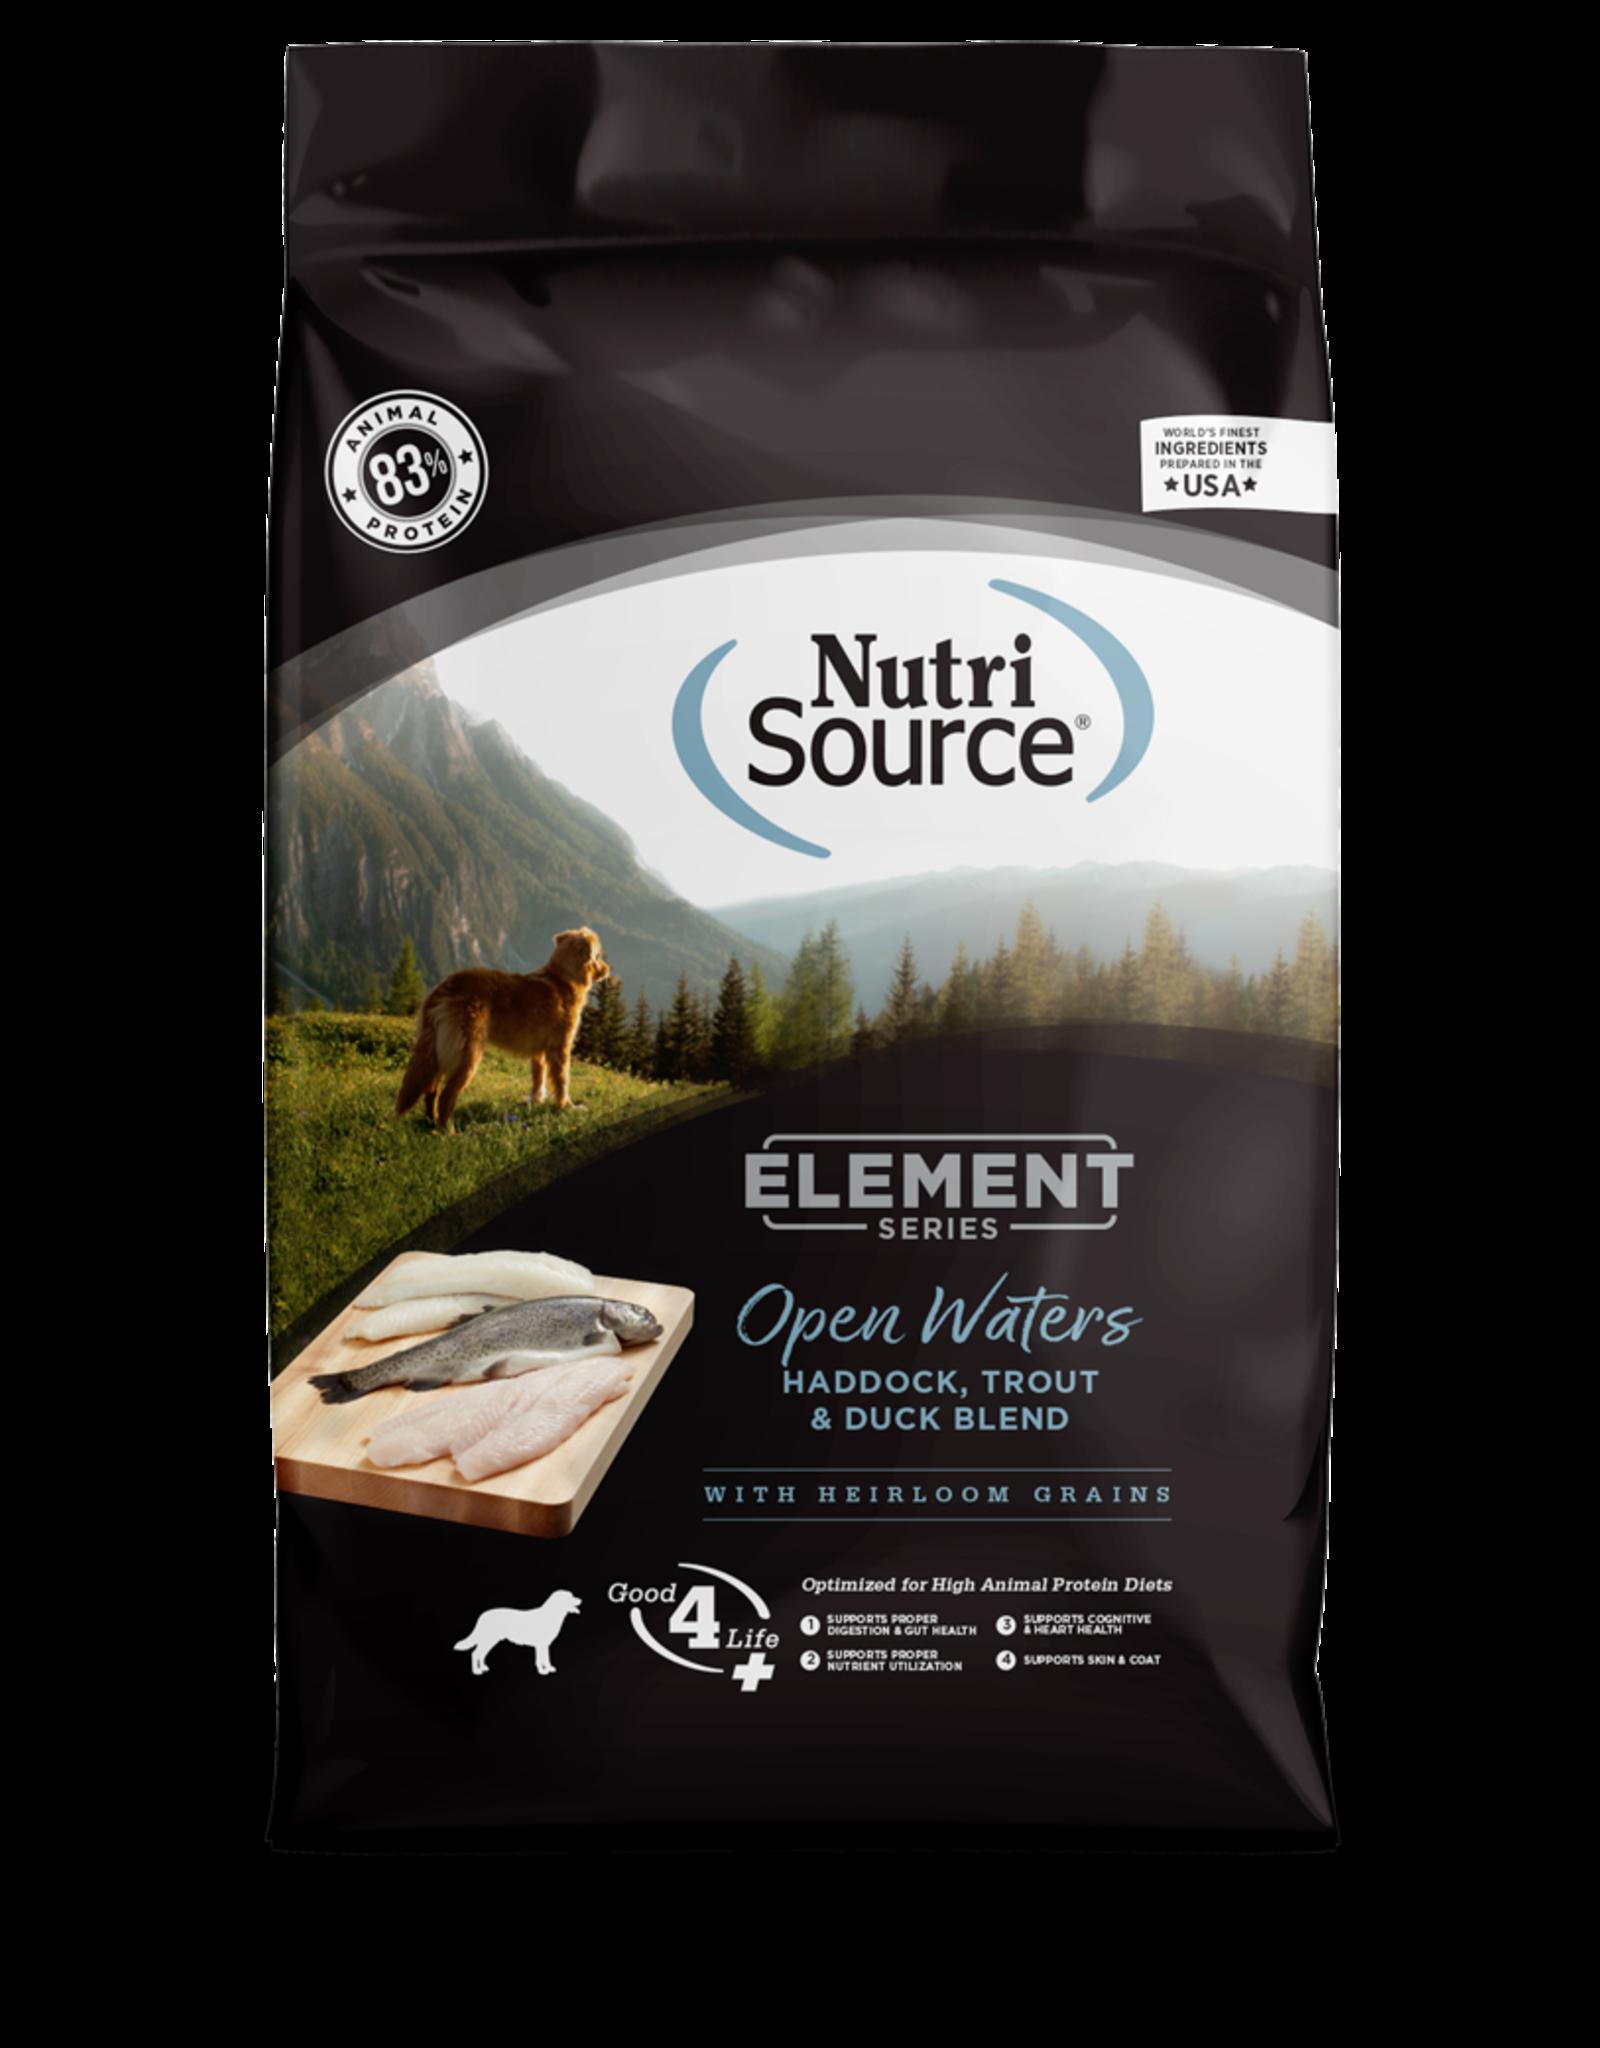 NutriSource Pet Foods NUTRISOURCE ELEMENT SERIES OPEN WATER BLEND